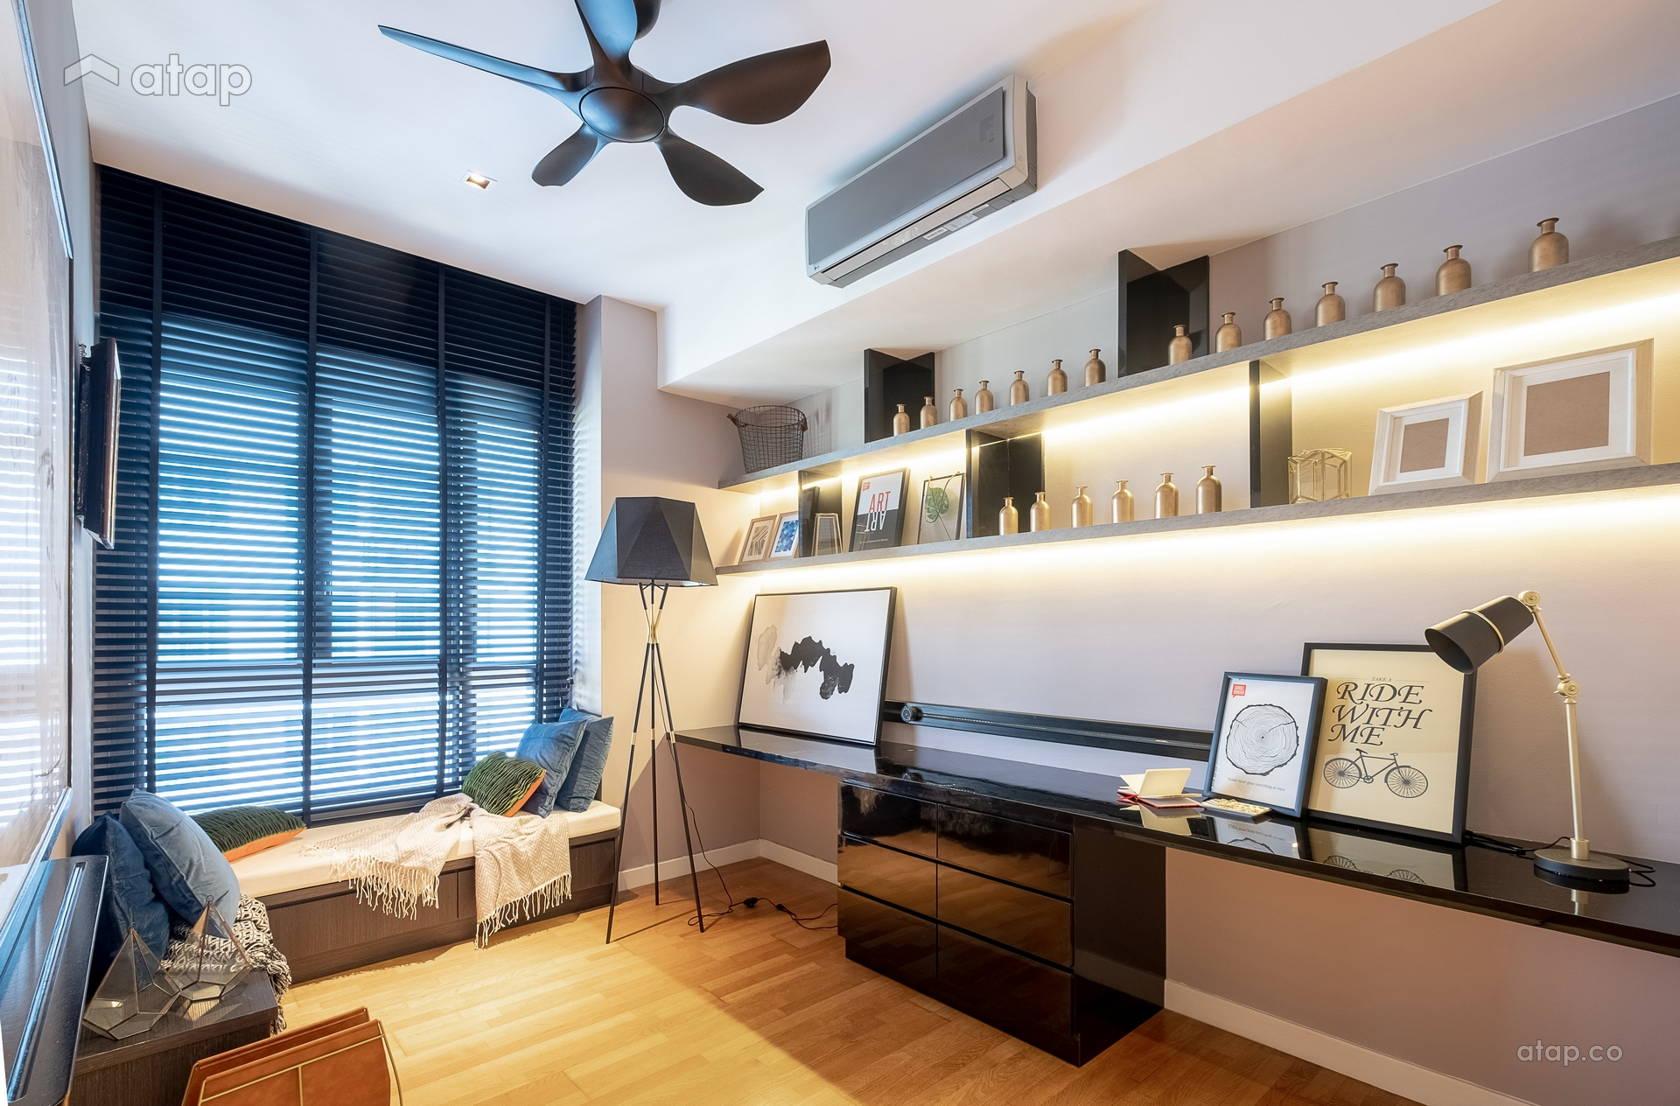 Minimalistic Modern Family Room Study Room Condominium Design Ideas Photos Malaysia Atap Co